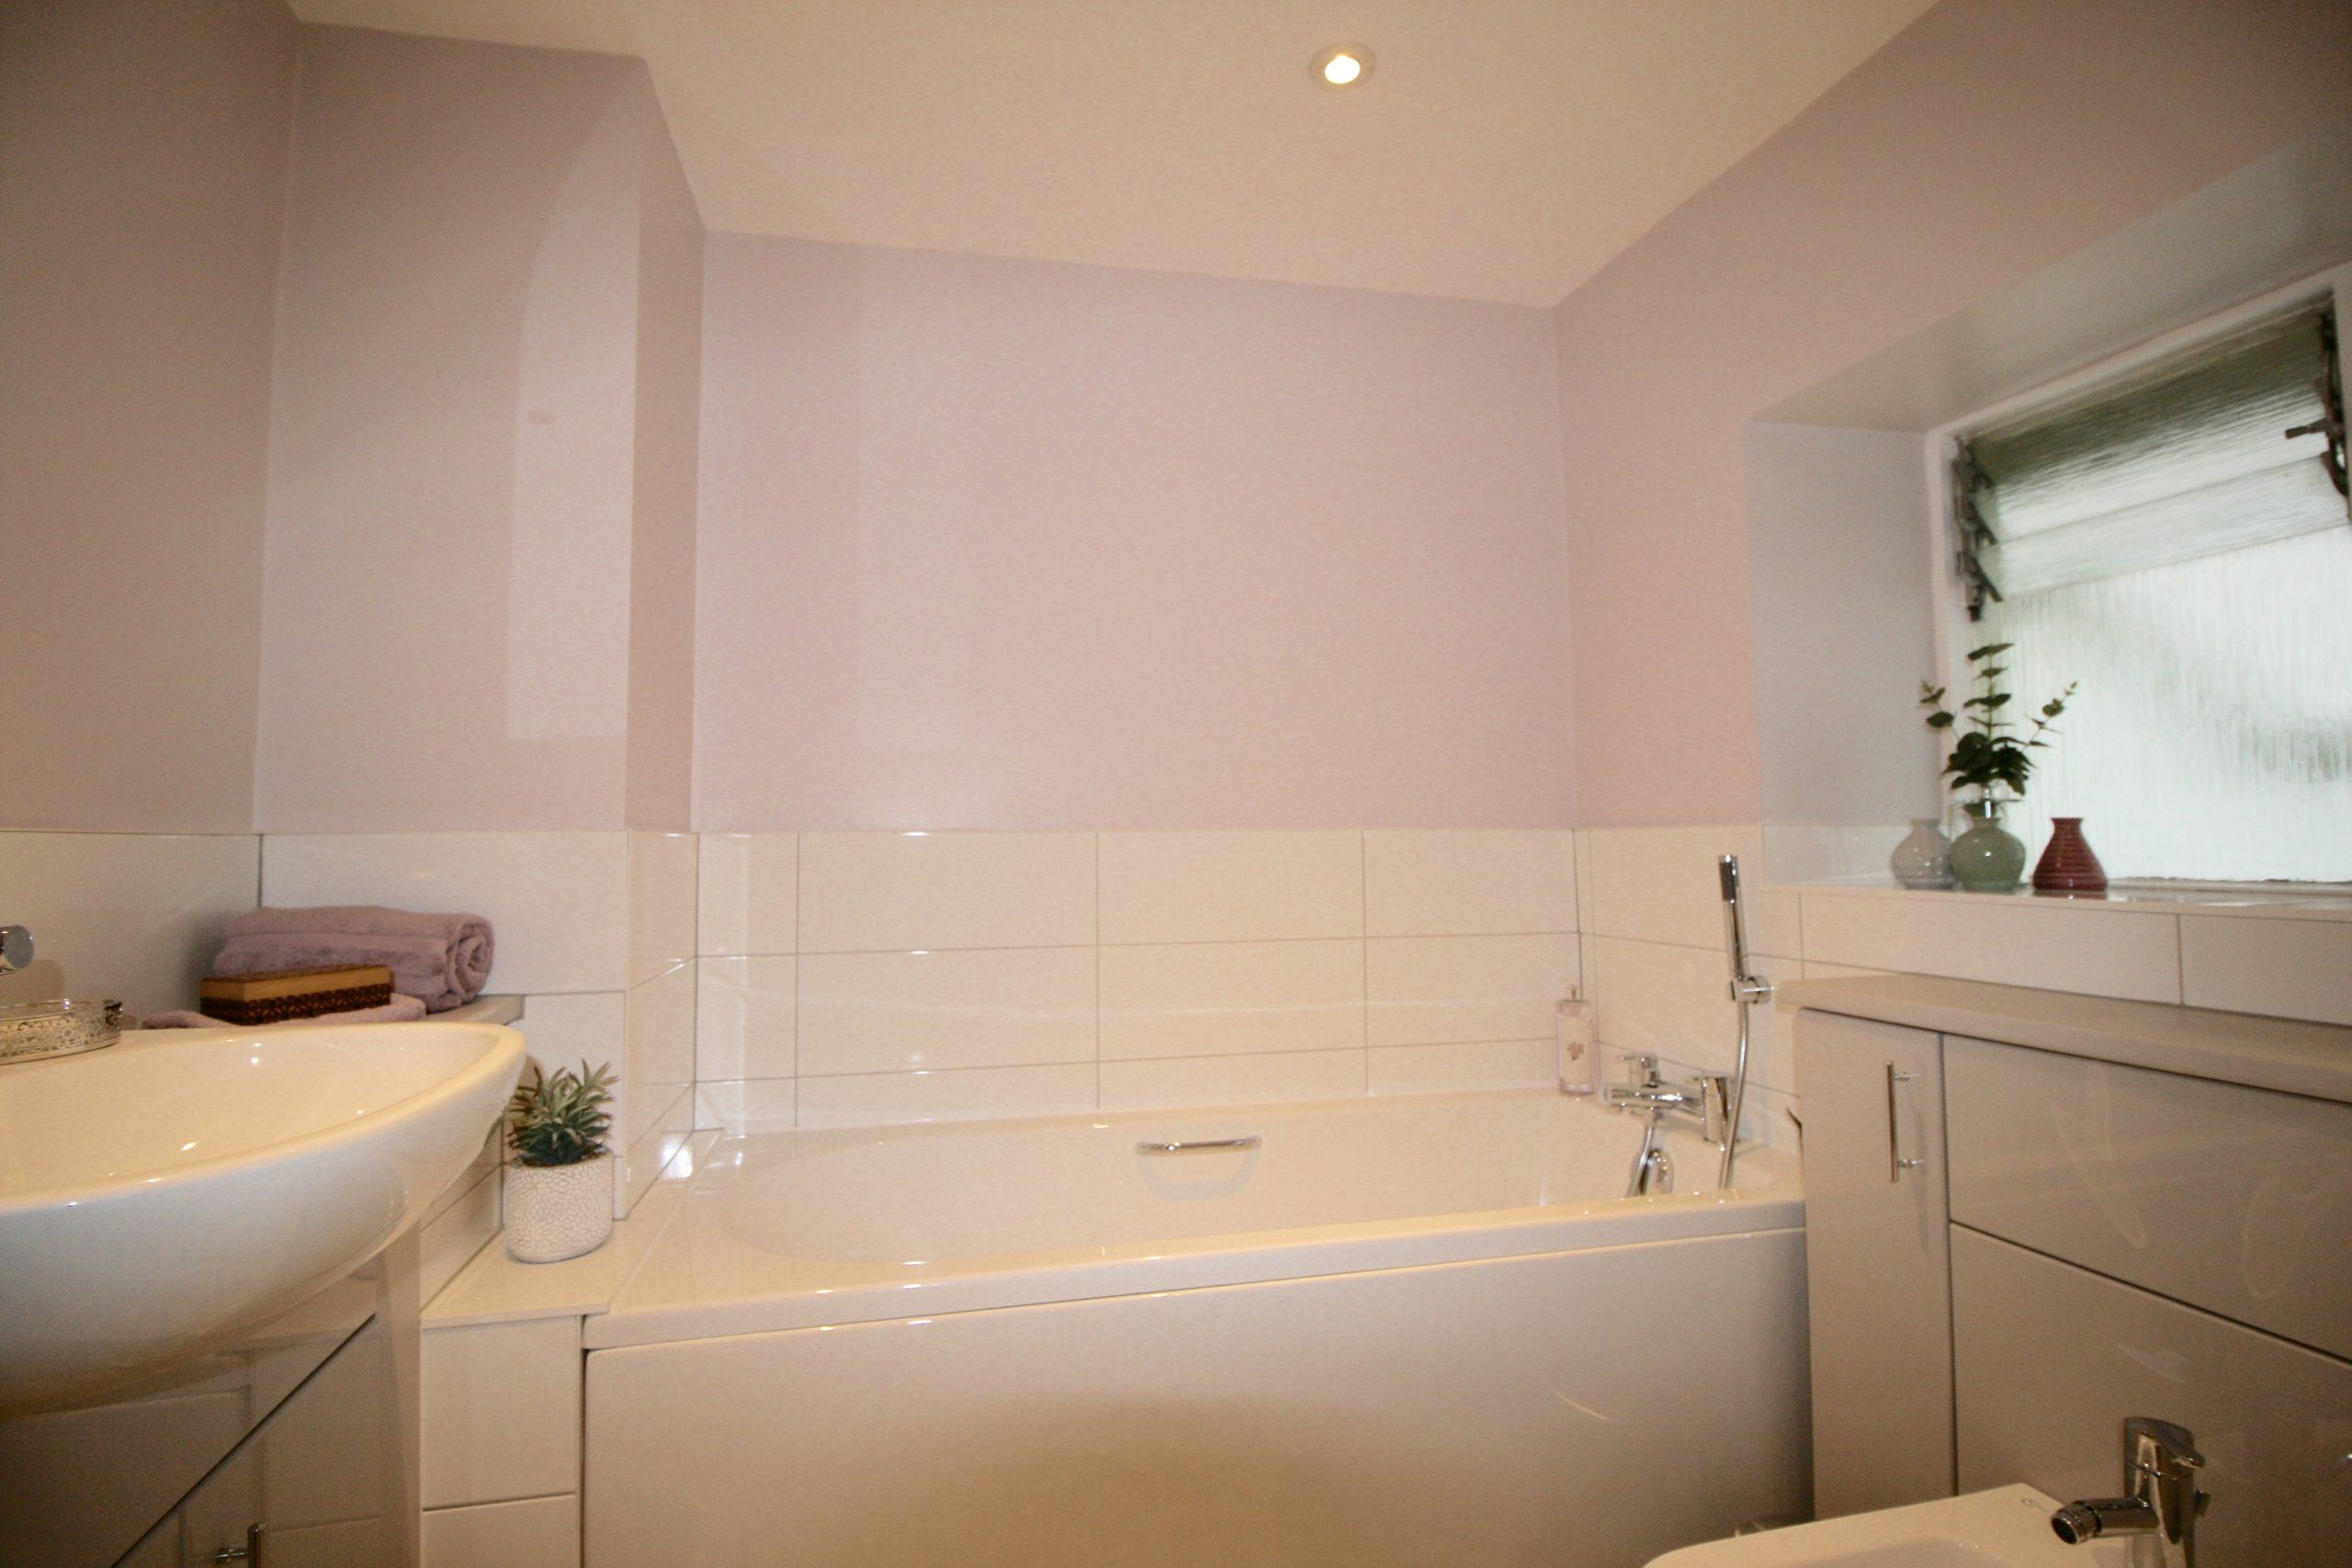 Dream bathroom - bath with grip handles